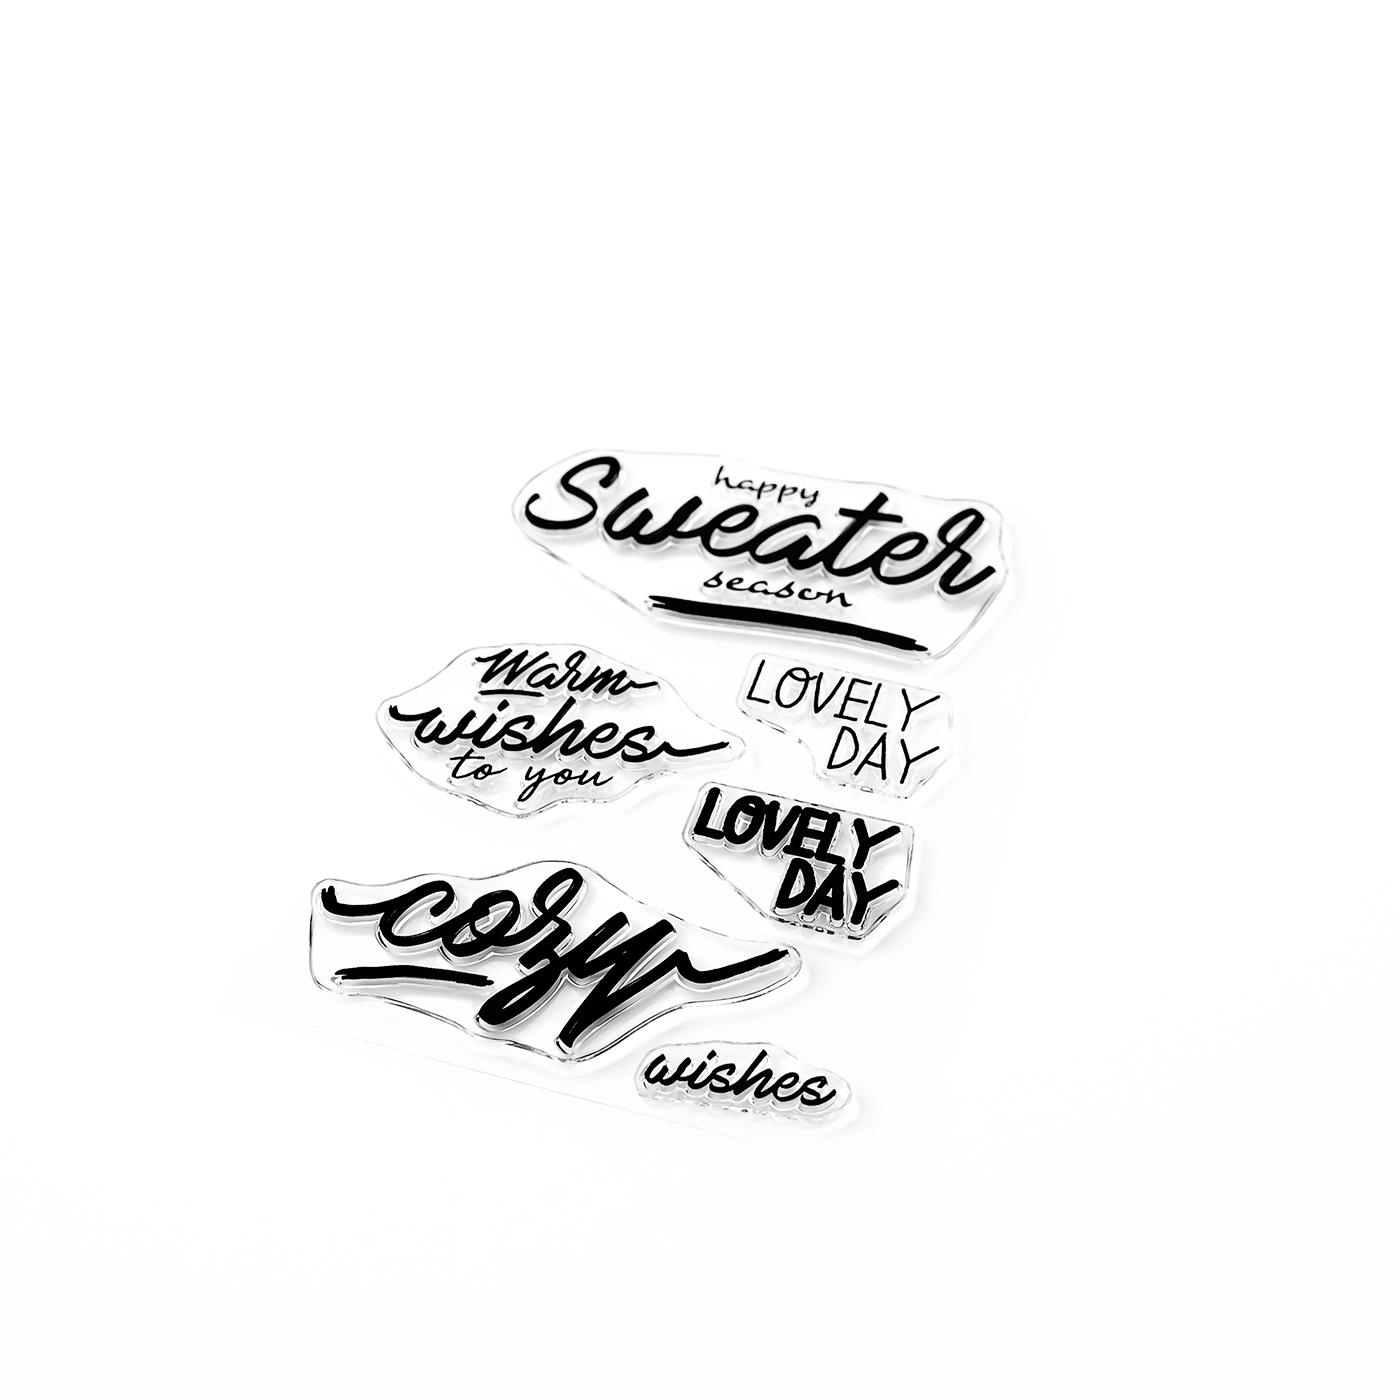 Sweater Season Sentiments Stamp